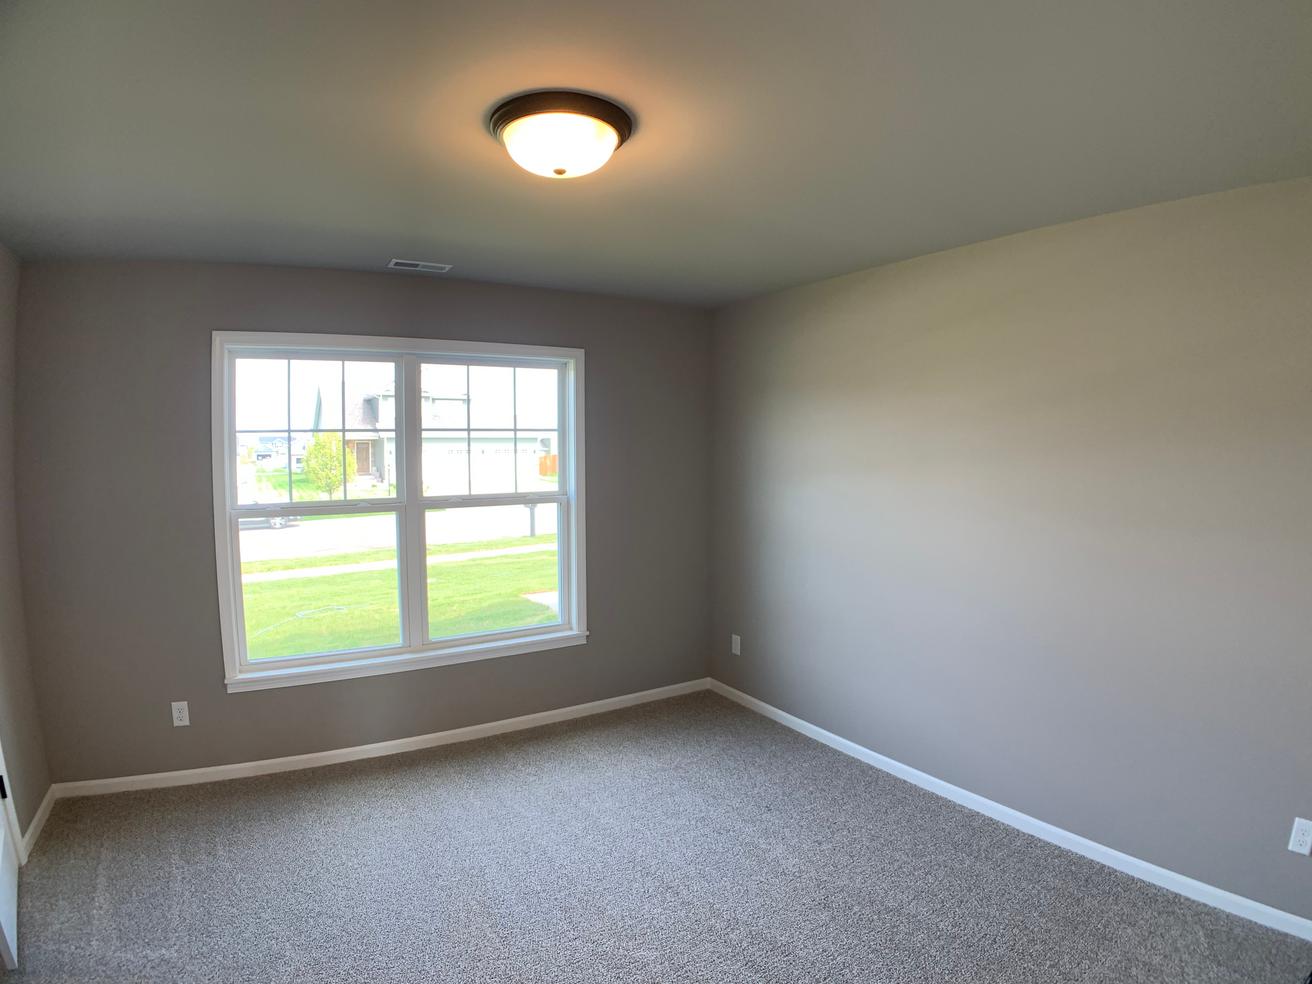 Taylor 3rd Bedroom 1